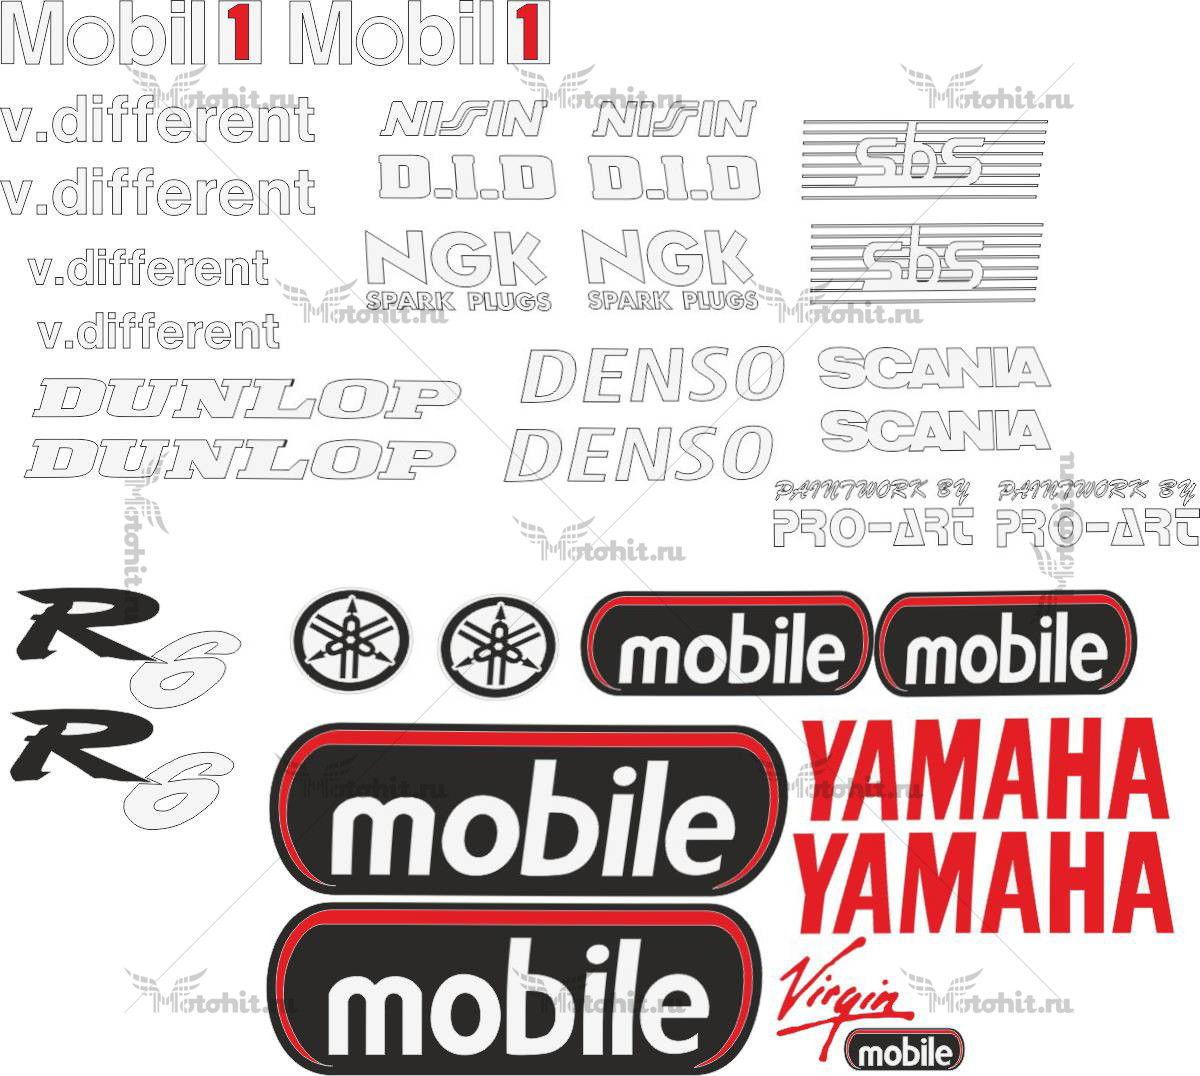 Комплект наклеек Yamaha YZF-R6 MOBILE